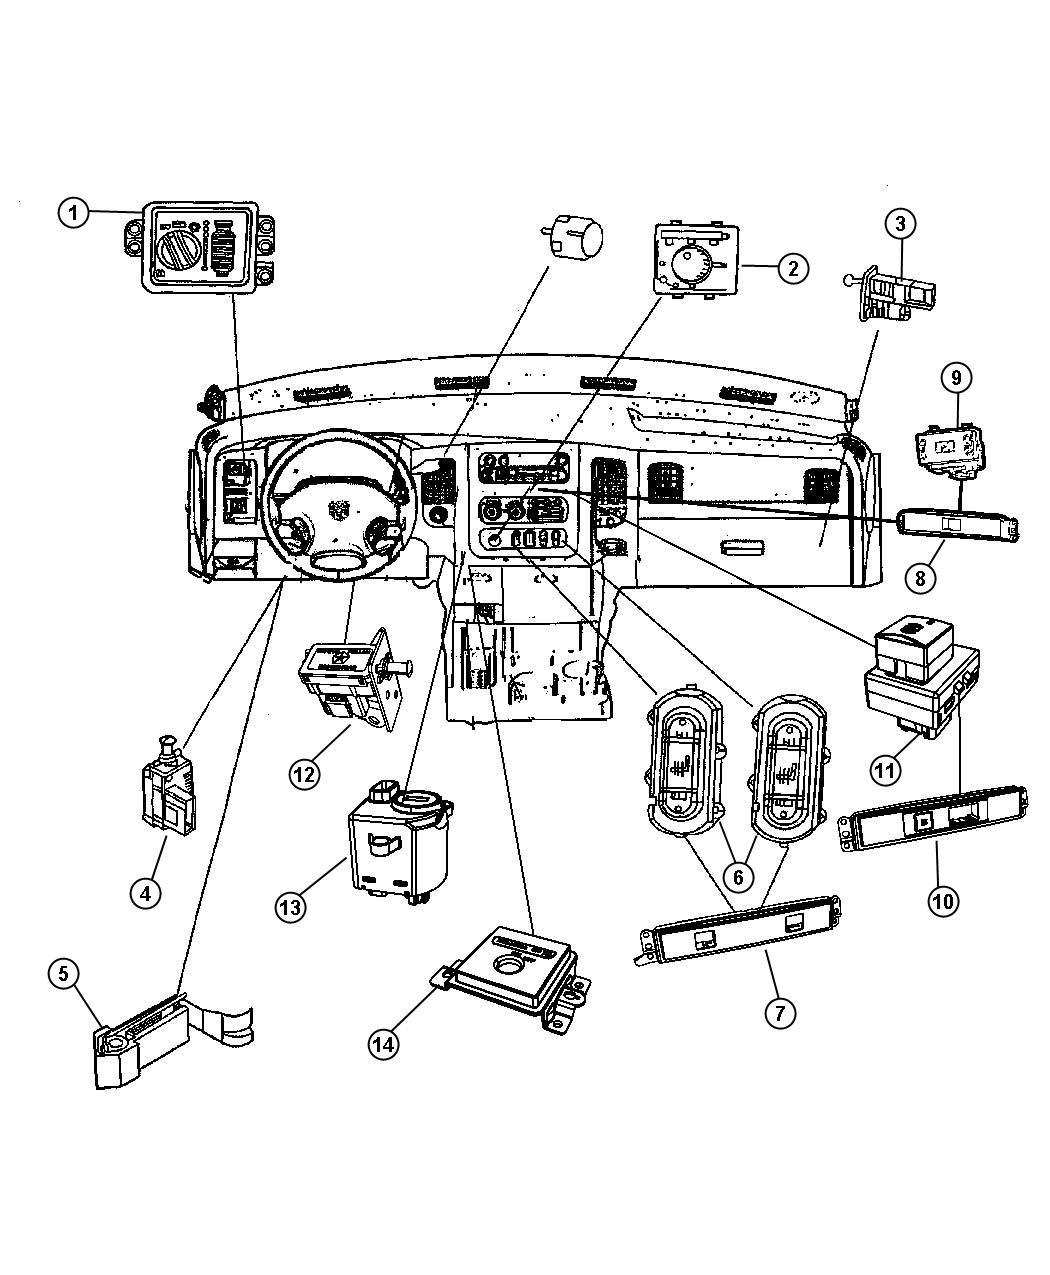 2008 Dodge Ram 5500 Bezel. Switch. Trim: [all trim codes